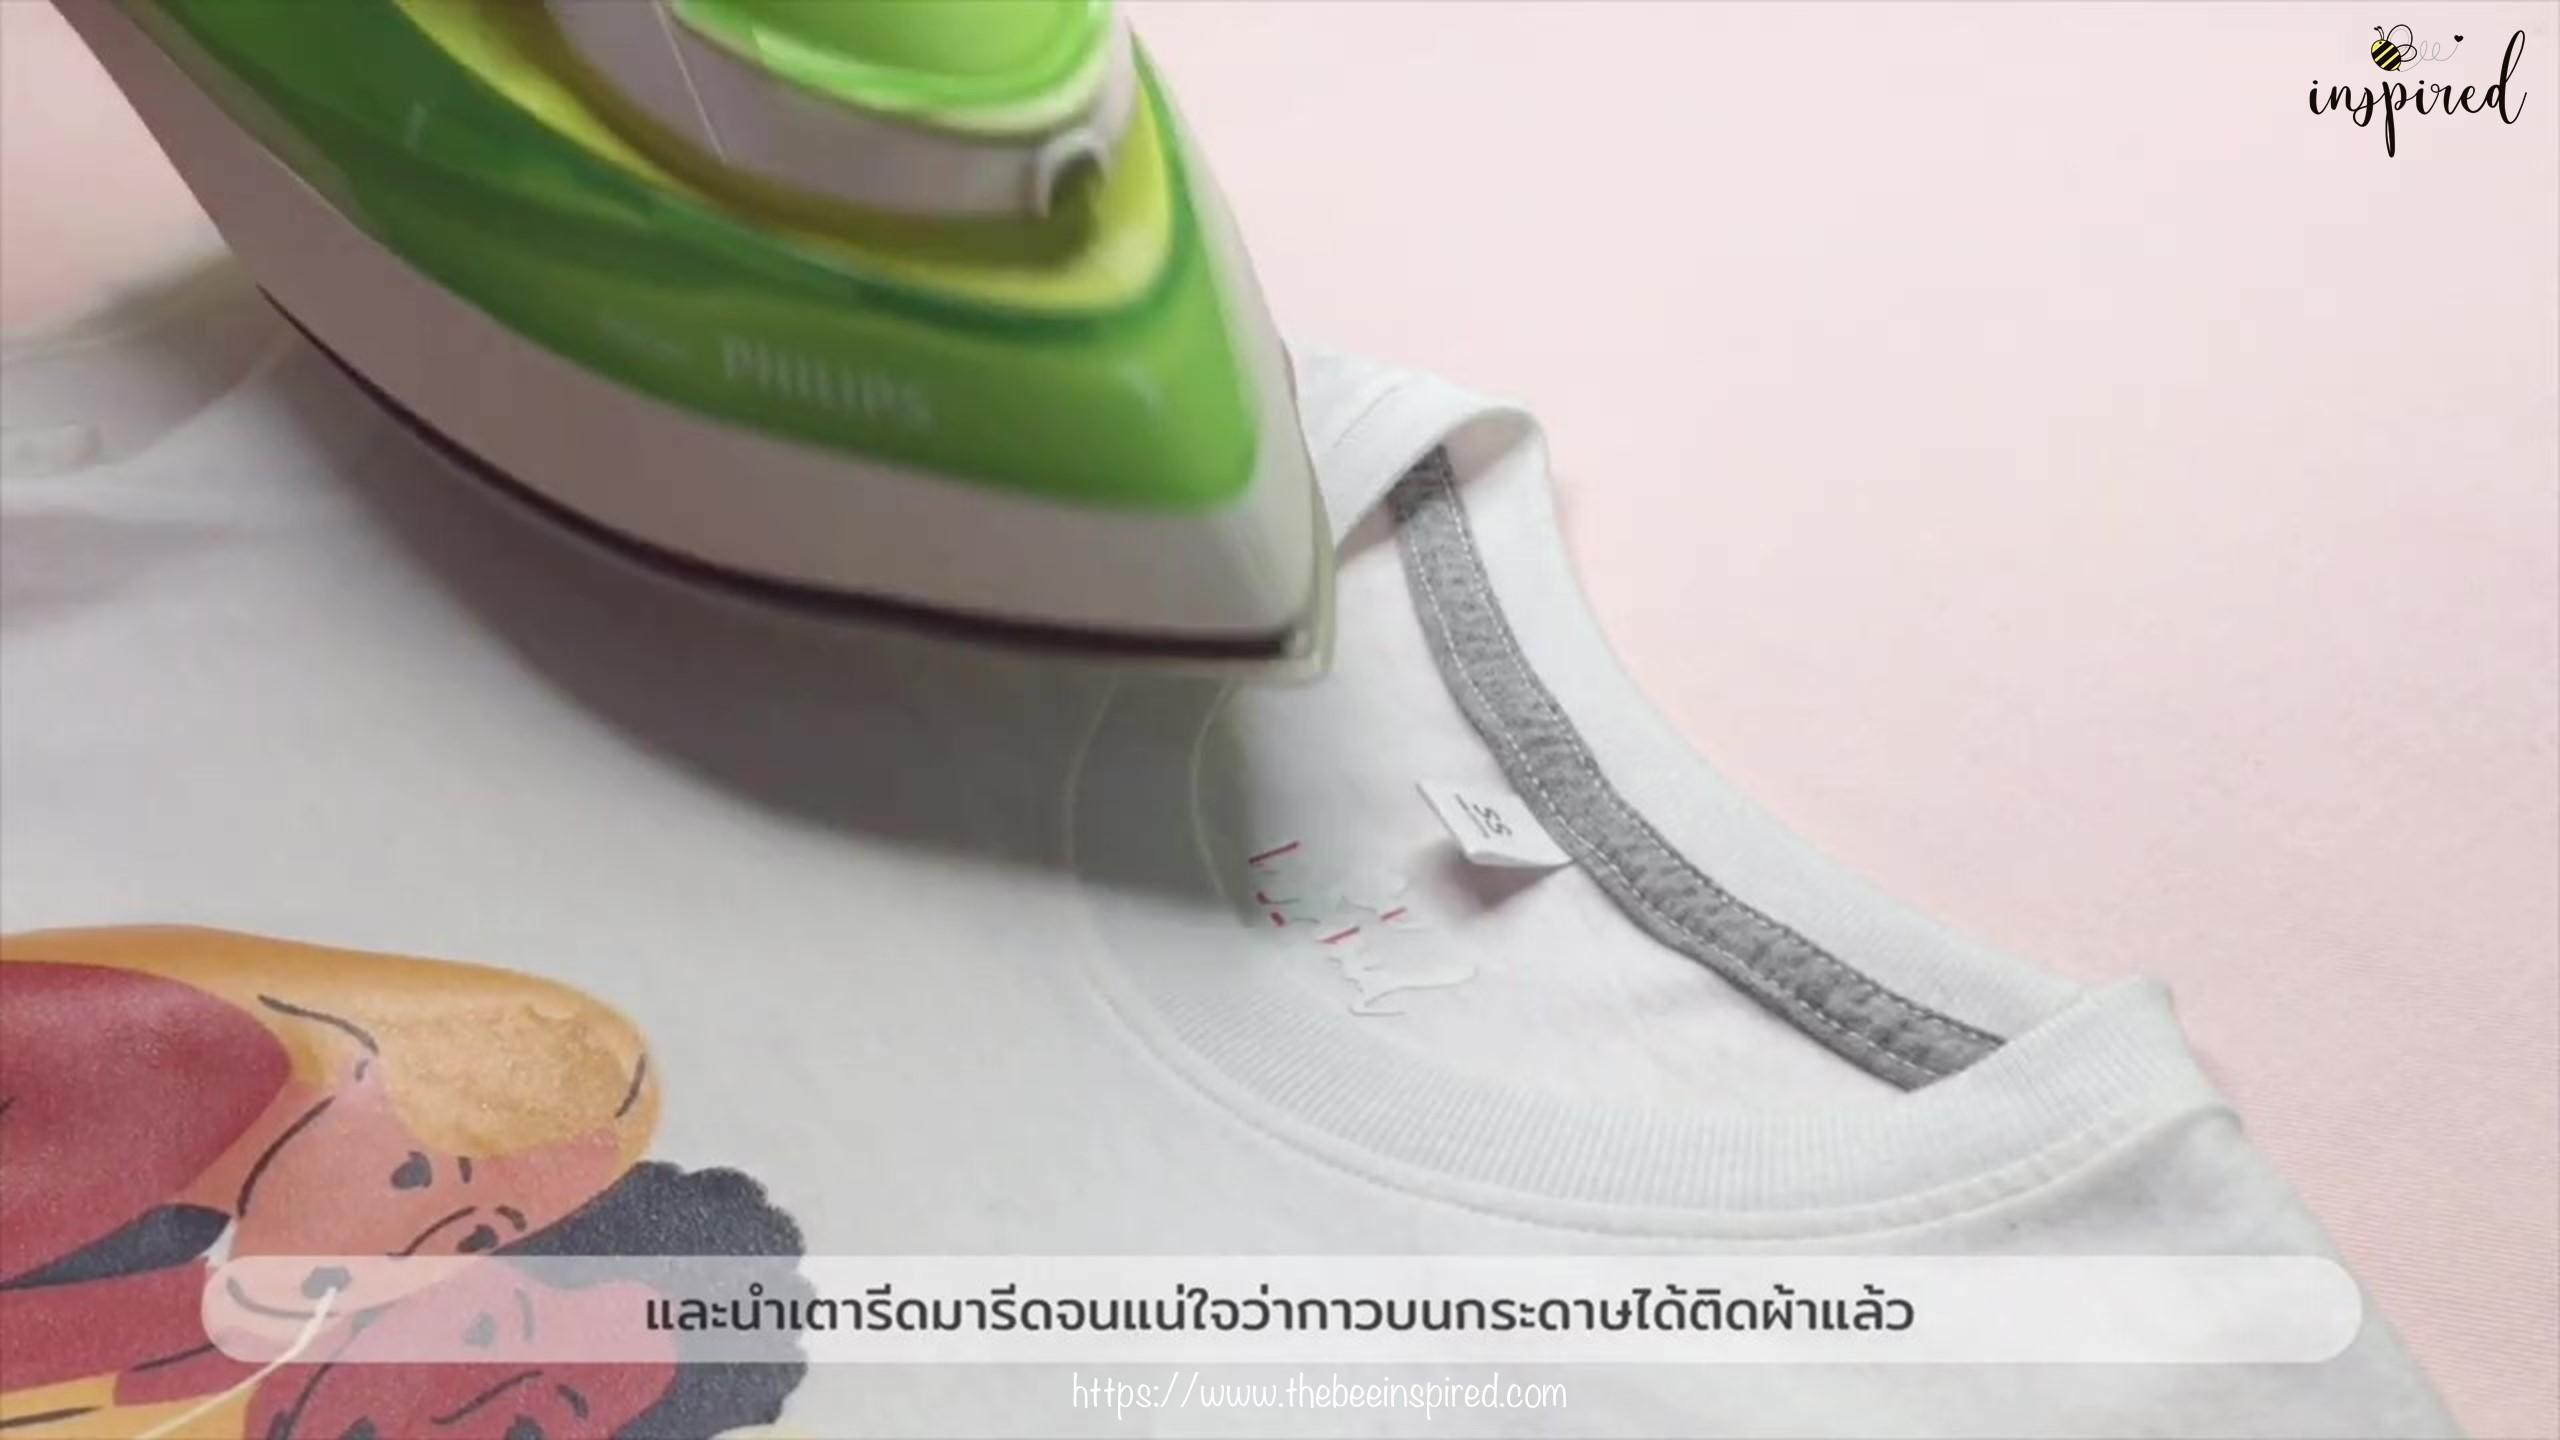 DIY 5 วิธีทำป้ายโลโก้แบรนด์ตัวเองที่บ้านแบบง่ายๆ I How to Make Your Own Fabric Labels at Home_5